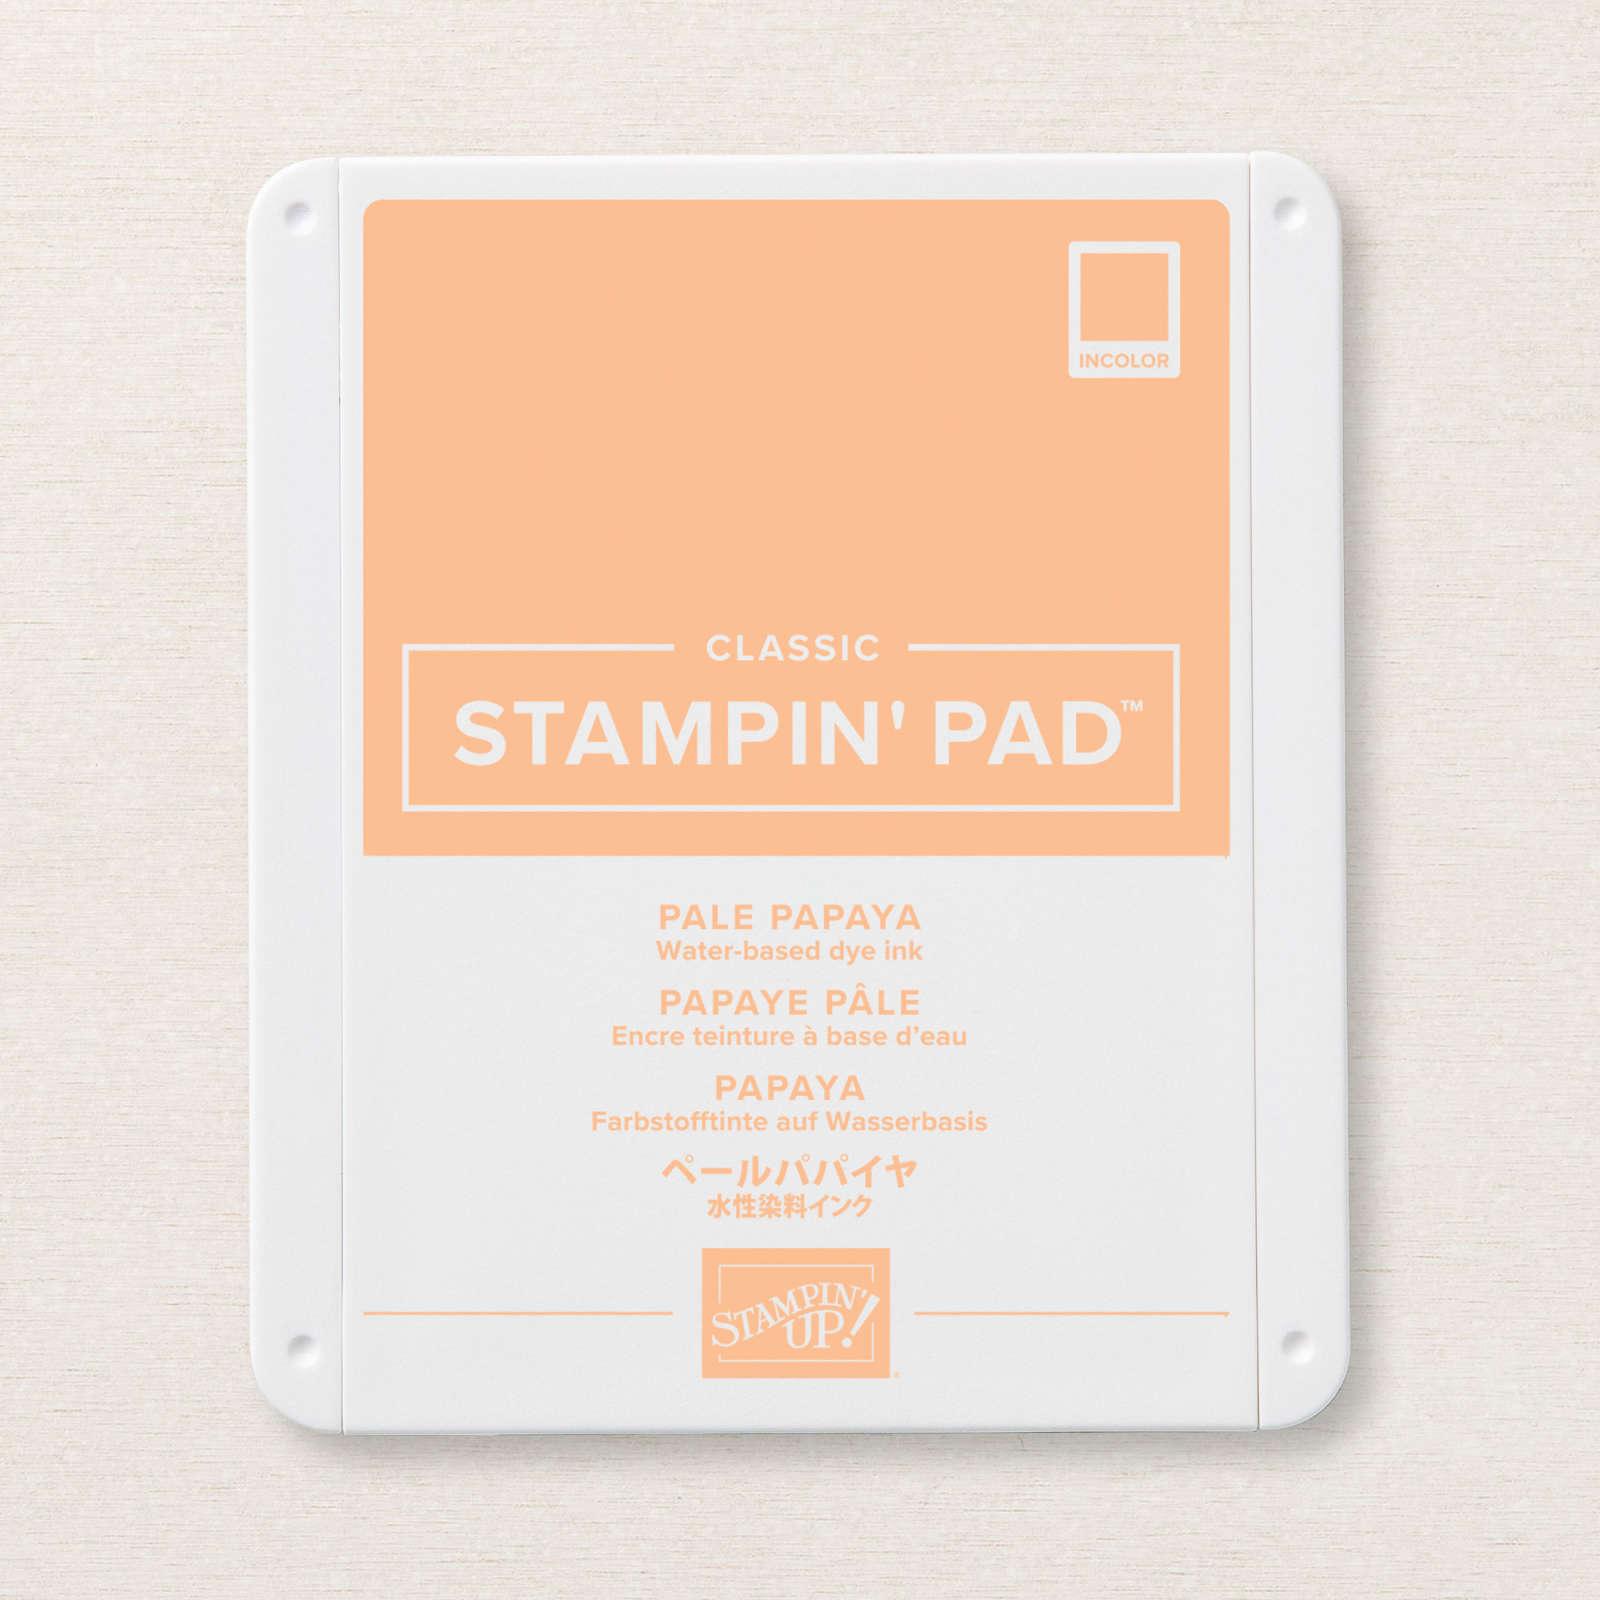 Pale Papaya Classic Stampin' Pad